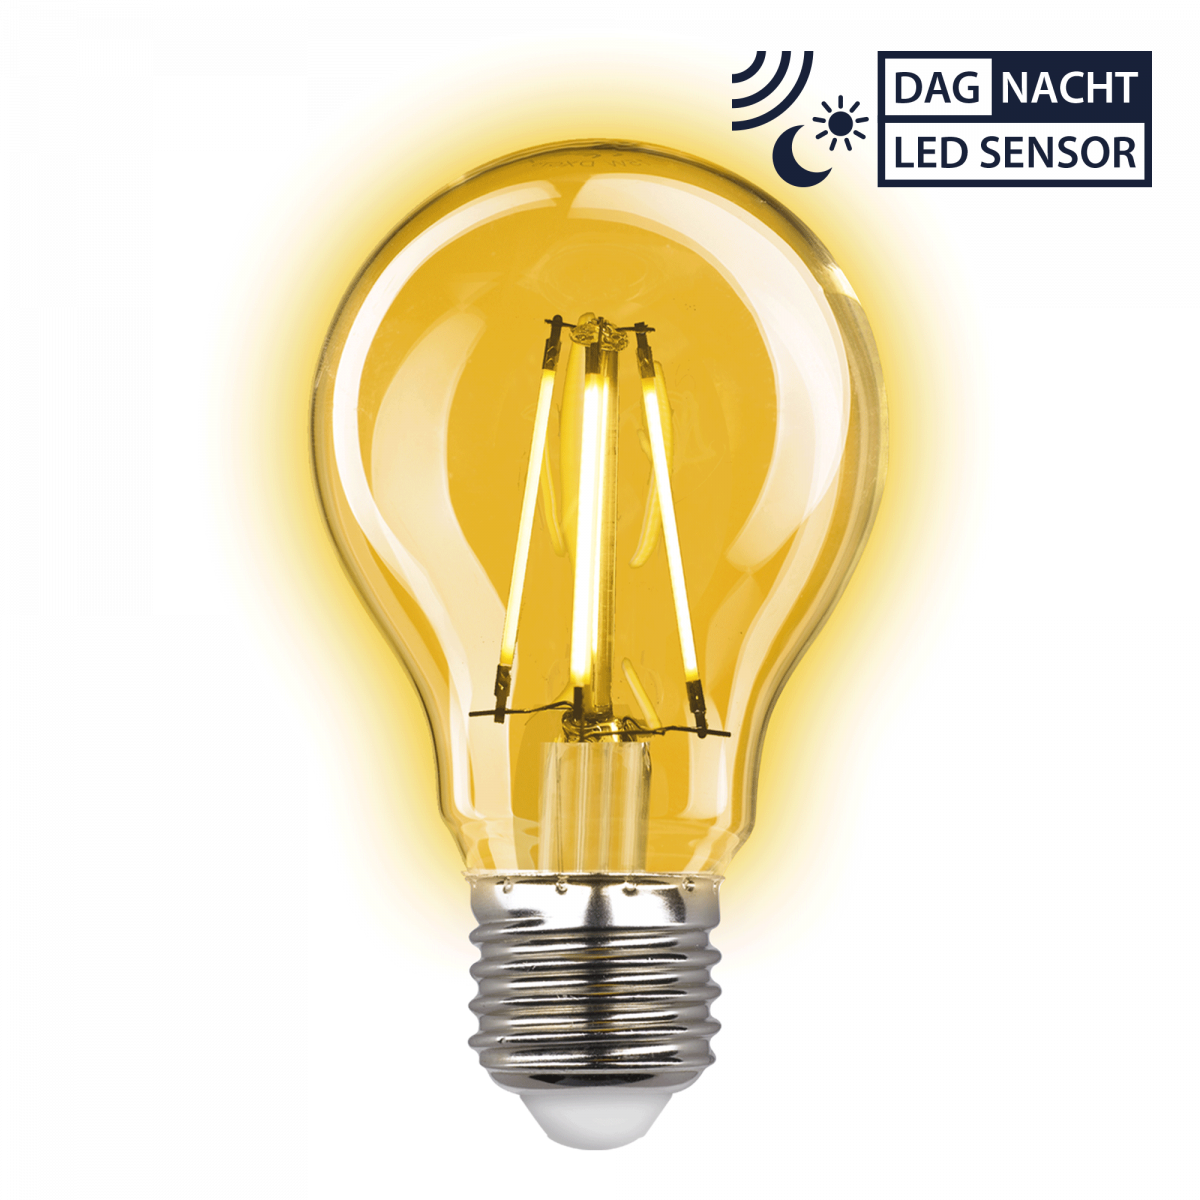 Buitenlamp Dolce Koper Dag Nacht sensor LED Schemersensor